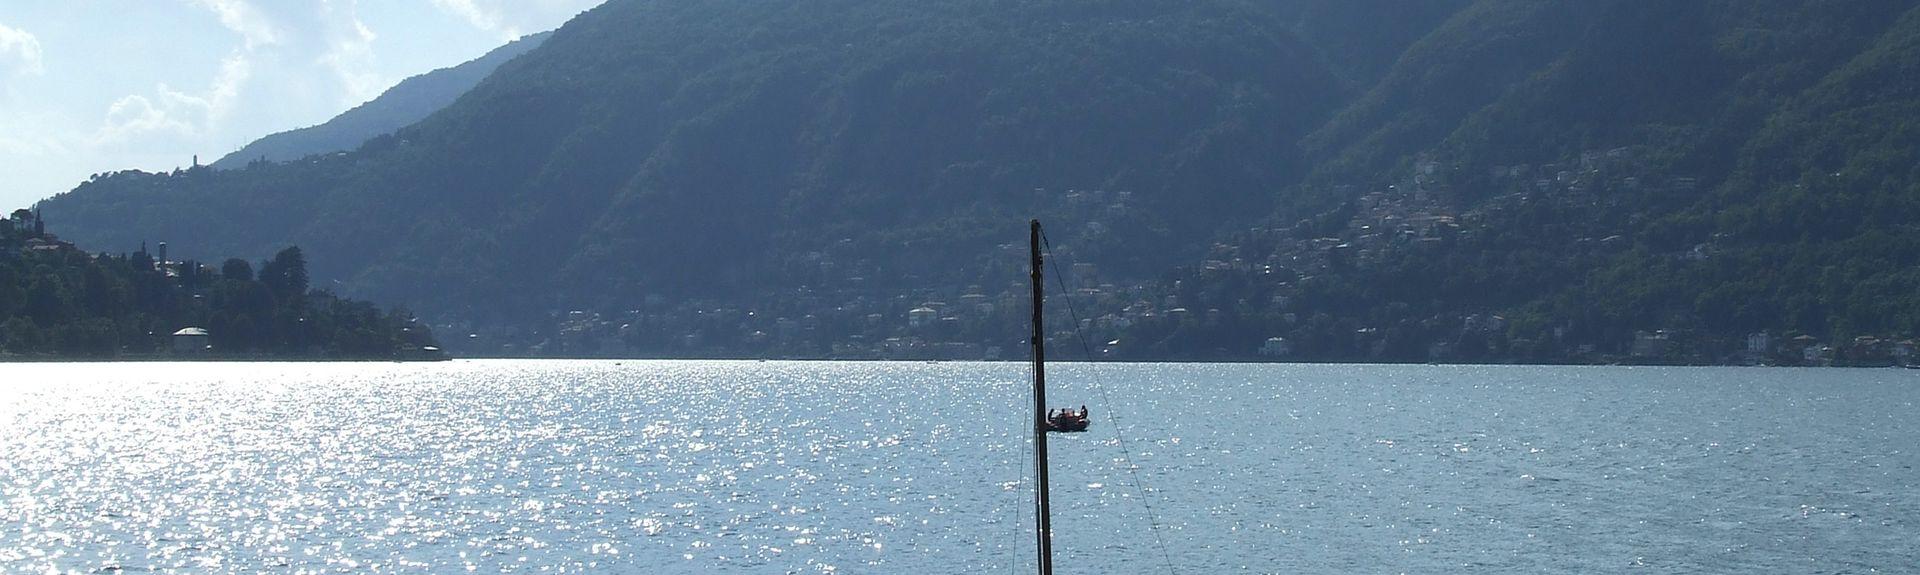 Torno, Como, Lombardy, Italy